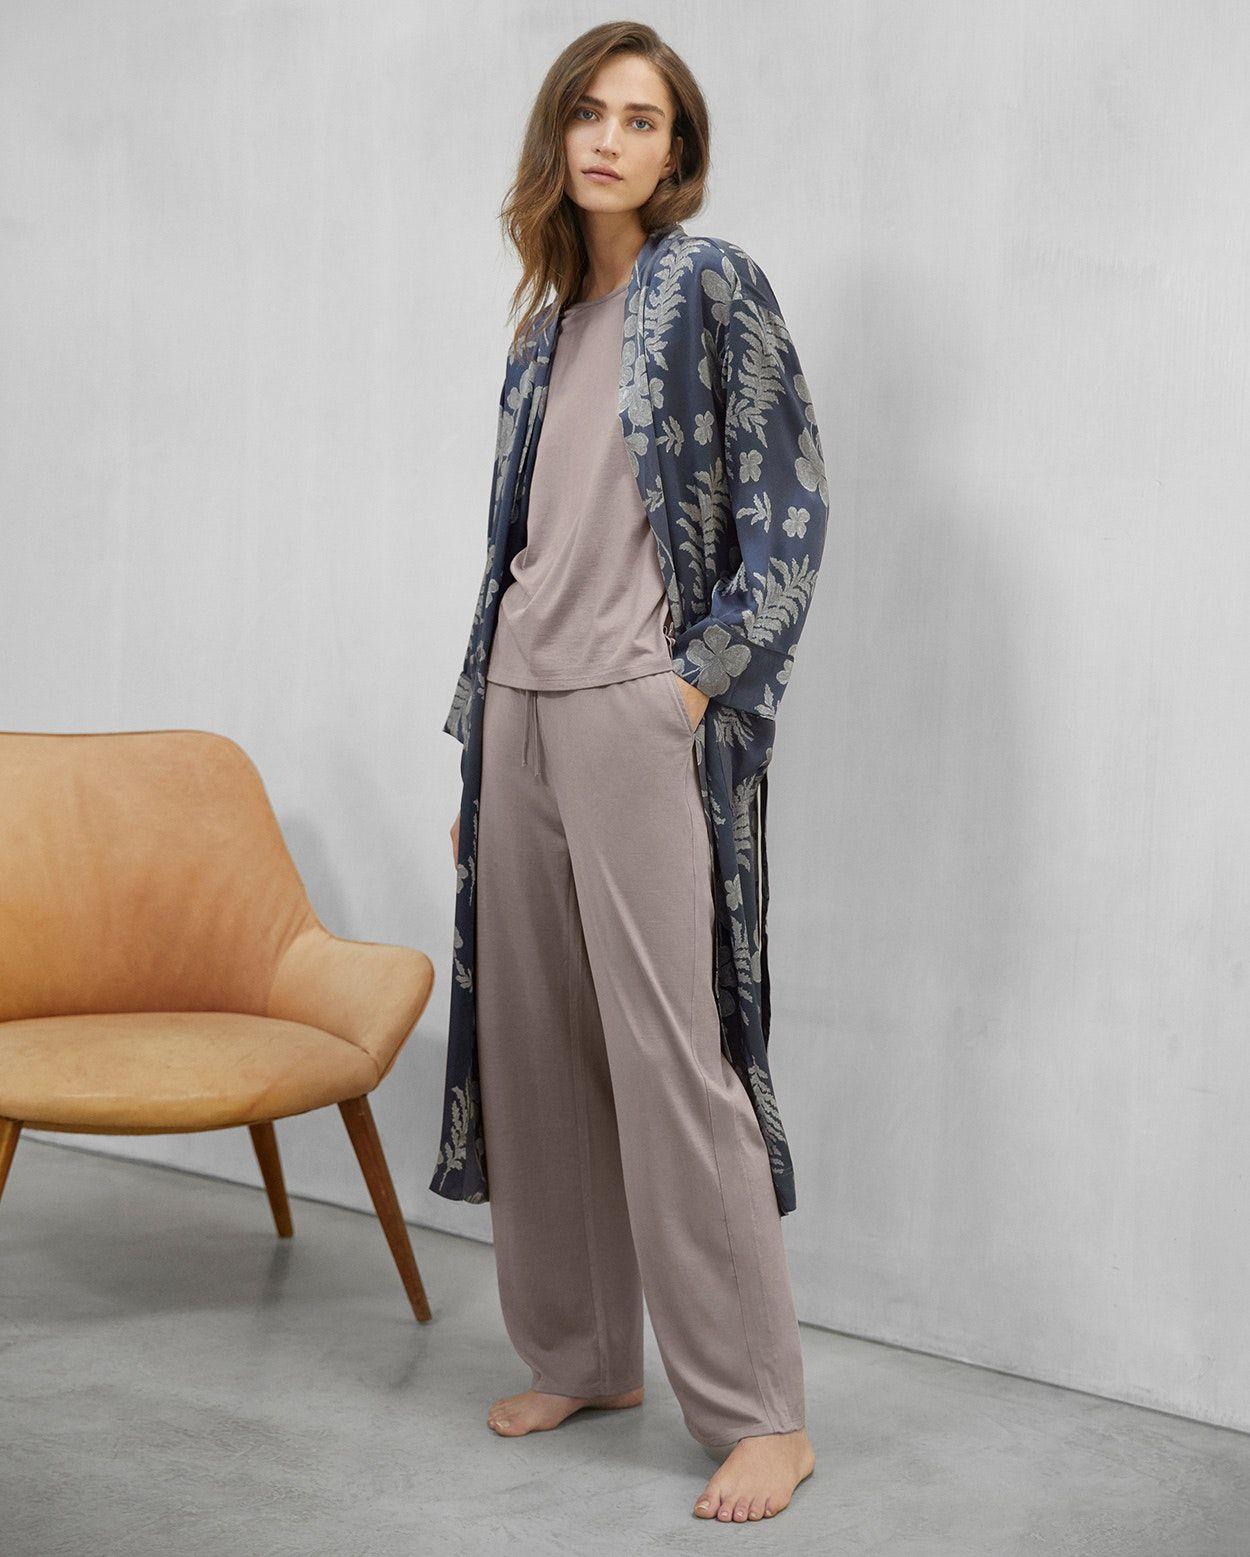 5bf195f3cd6526 Poetry - Silk cotton pyjamas | AW 19/20 HOME&SLEEP WEAR in 2019 ...